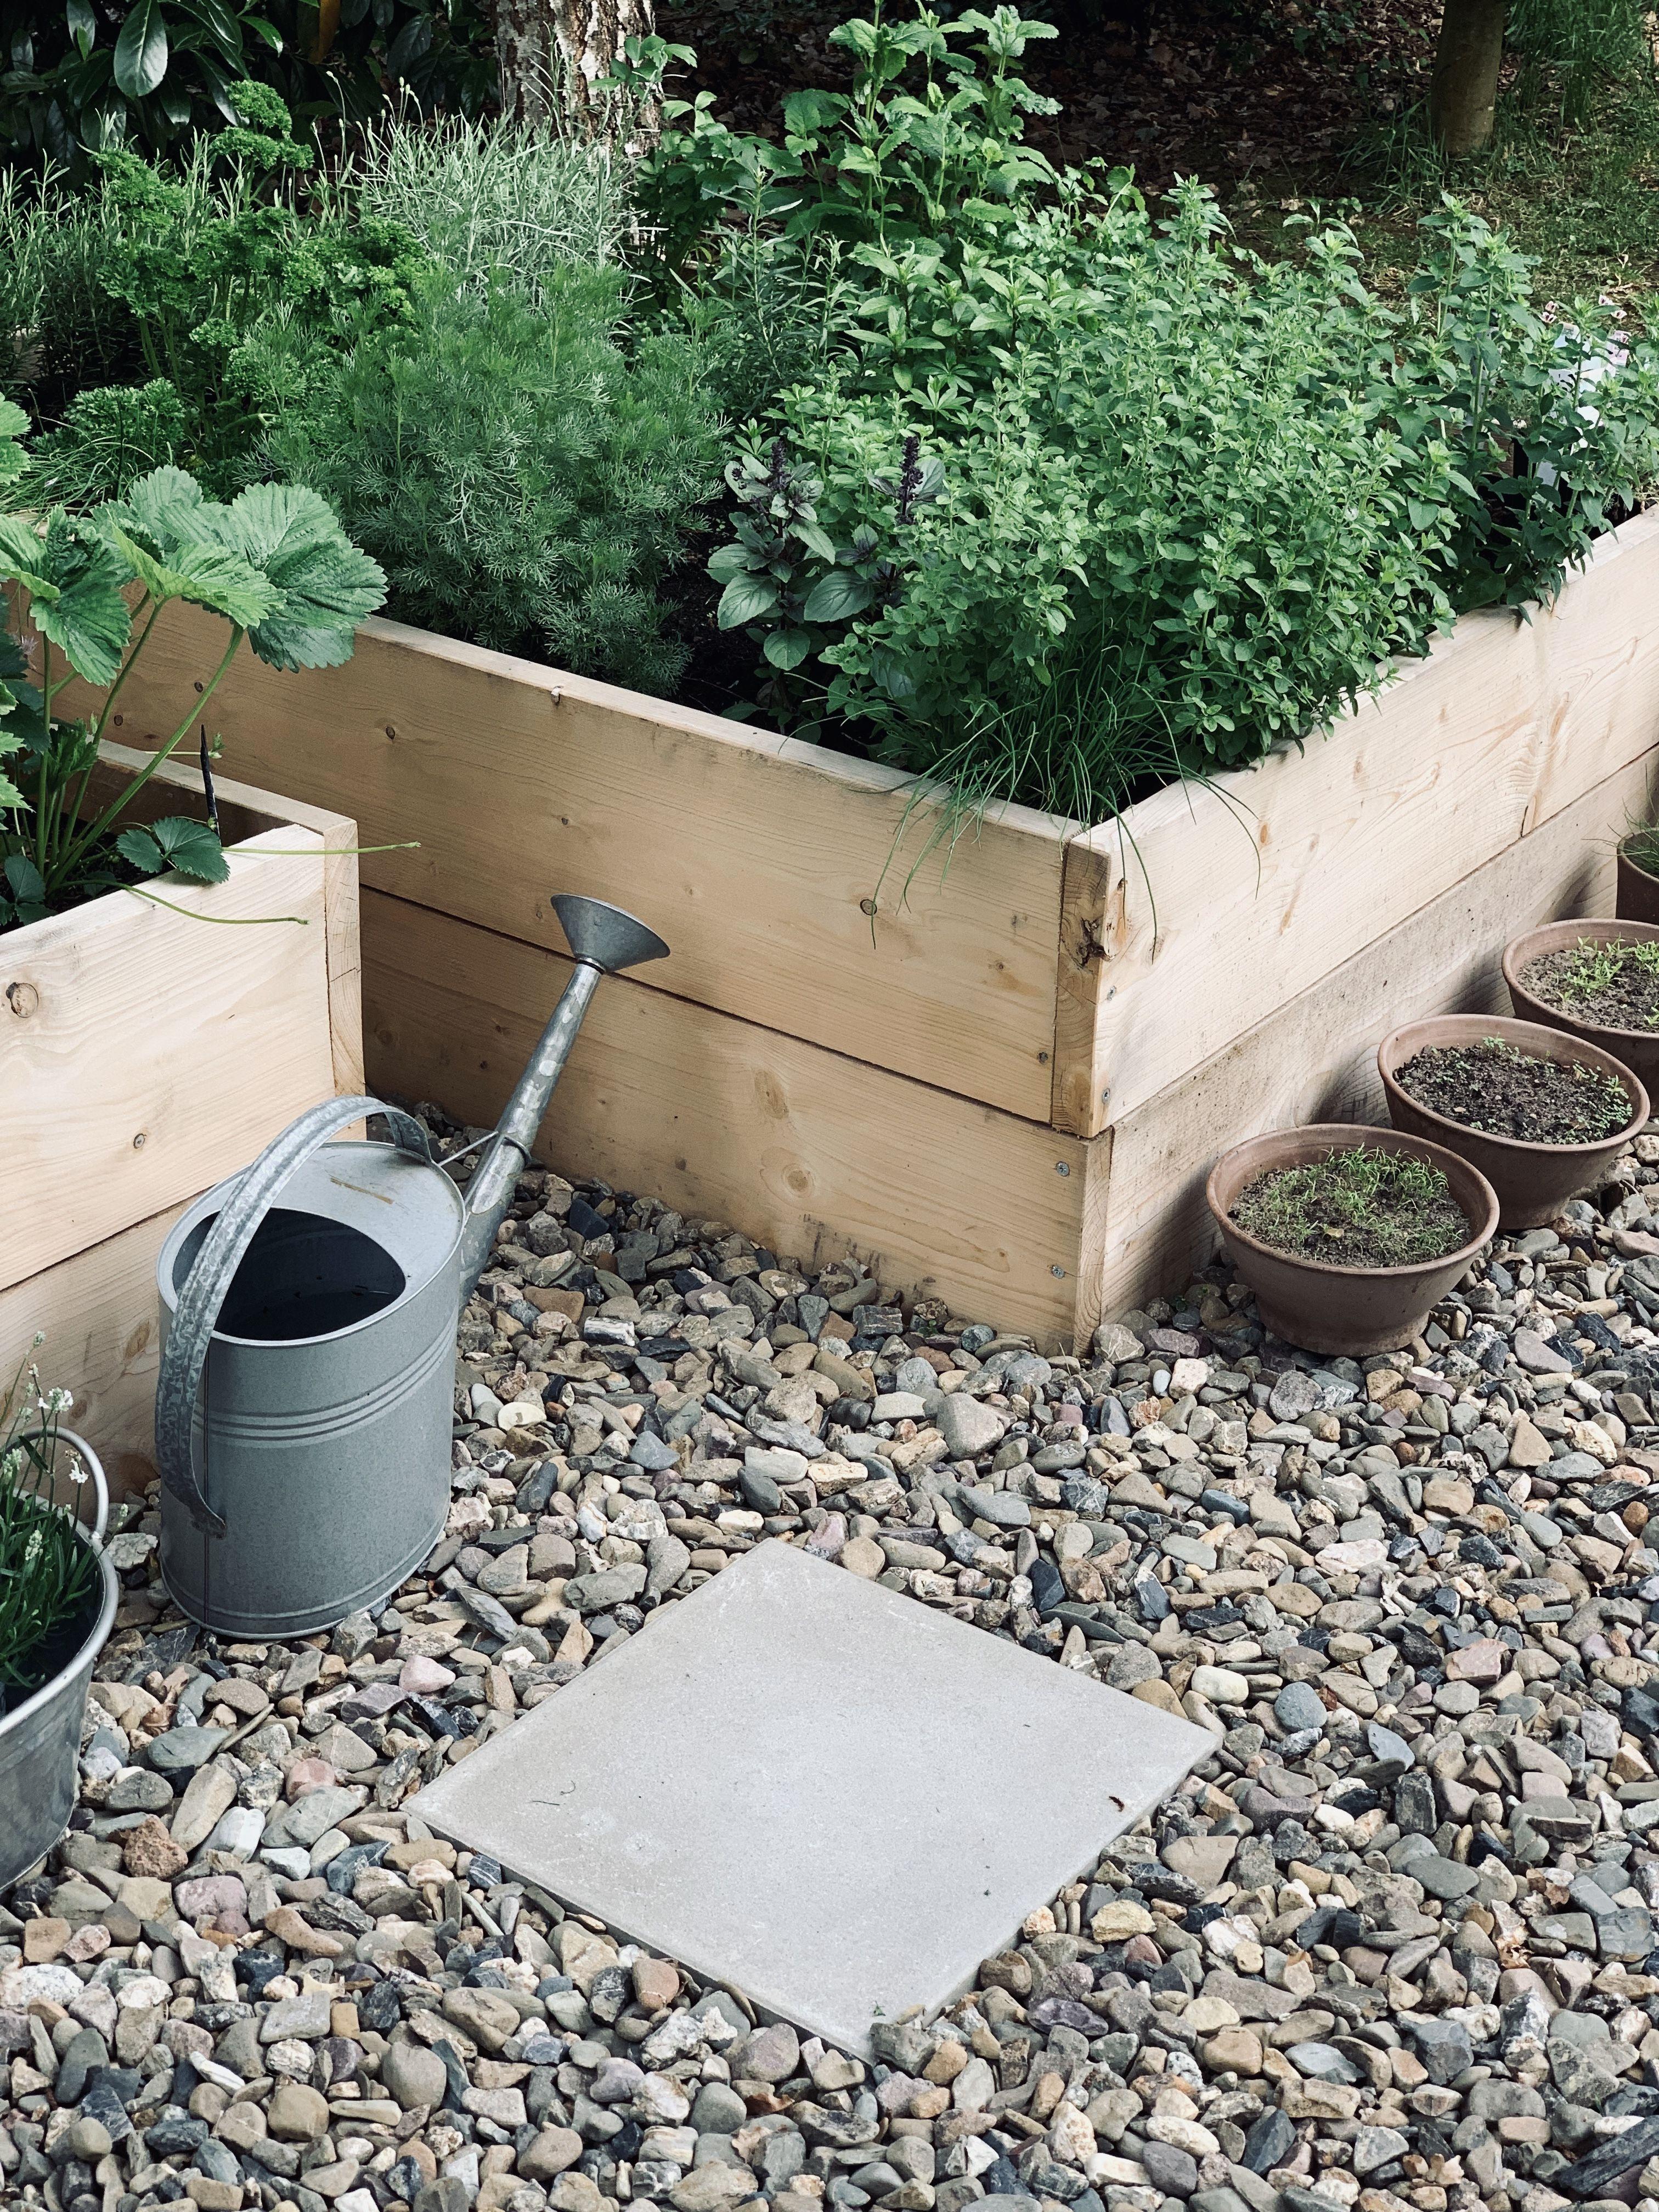 Hochbeet Anlegen Befullen Und Bepflanzen Diy Bauanleitung Hochbeet Garten Hochbeet Hochbeet Anlegen